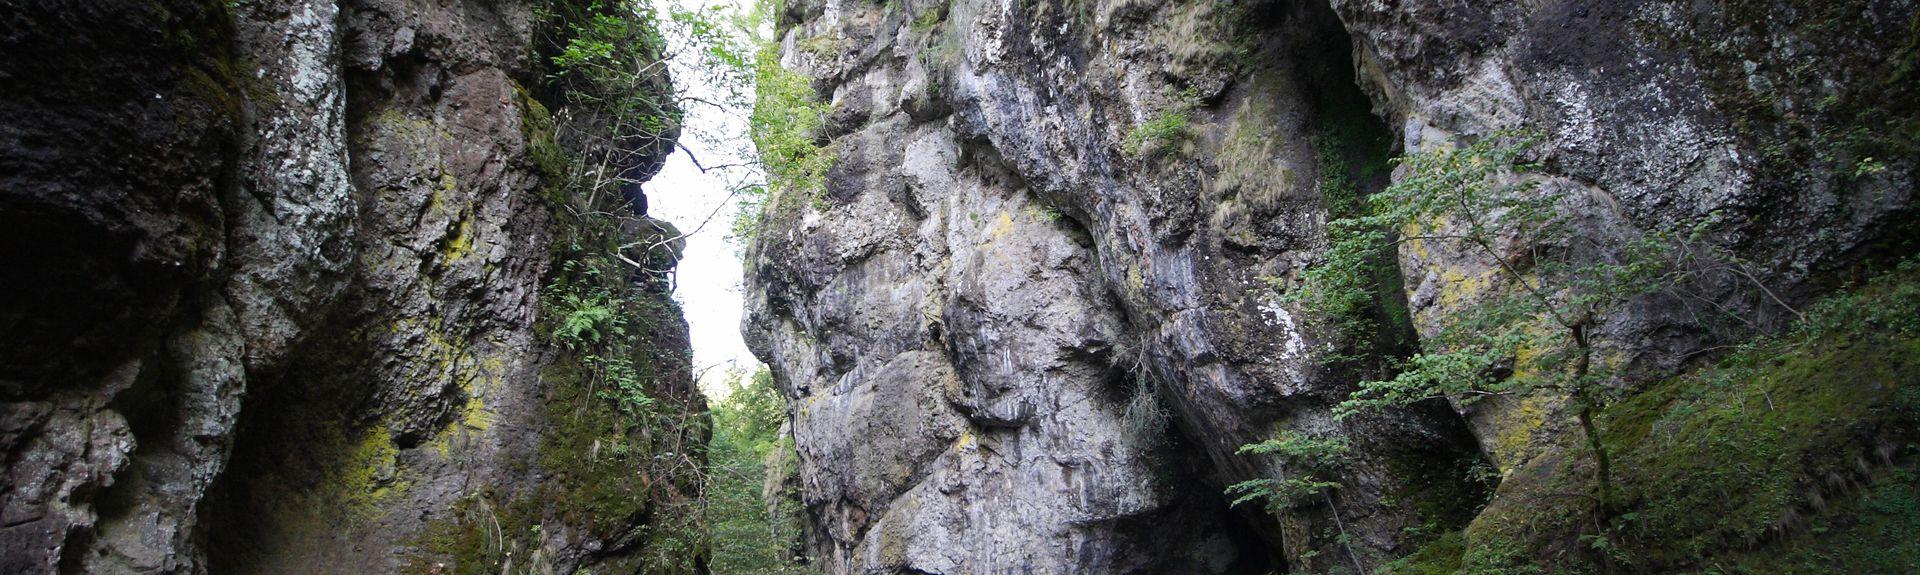 Arpajon-sur-Cere, Auvergne-Rhône-Alpes, Francja